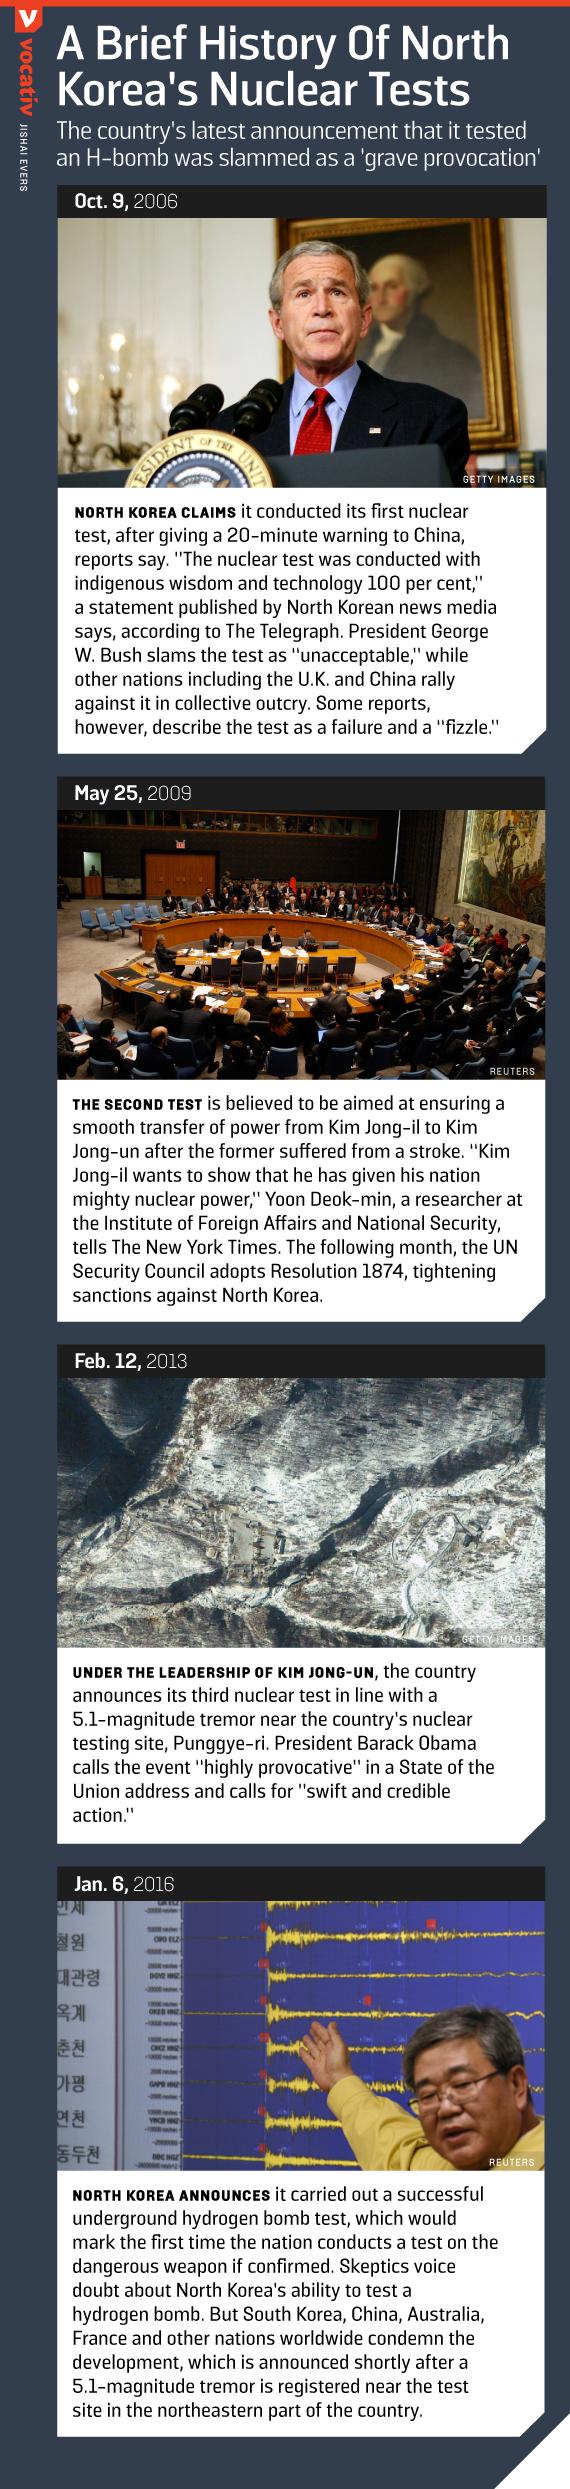 BHO NorthKorea2